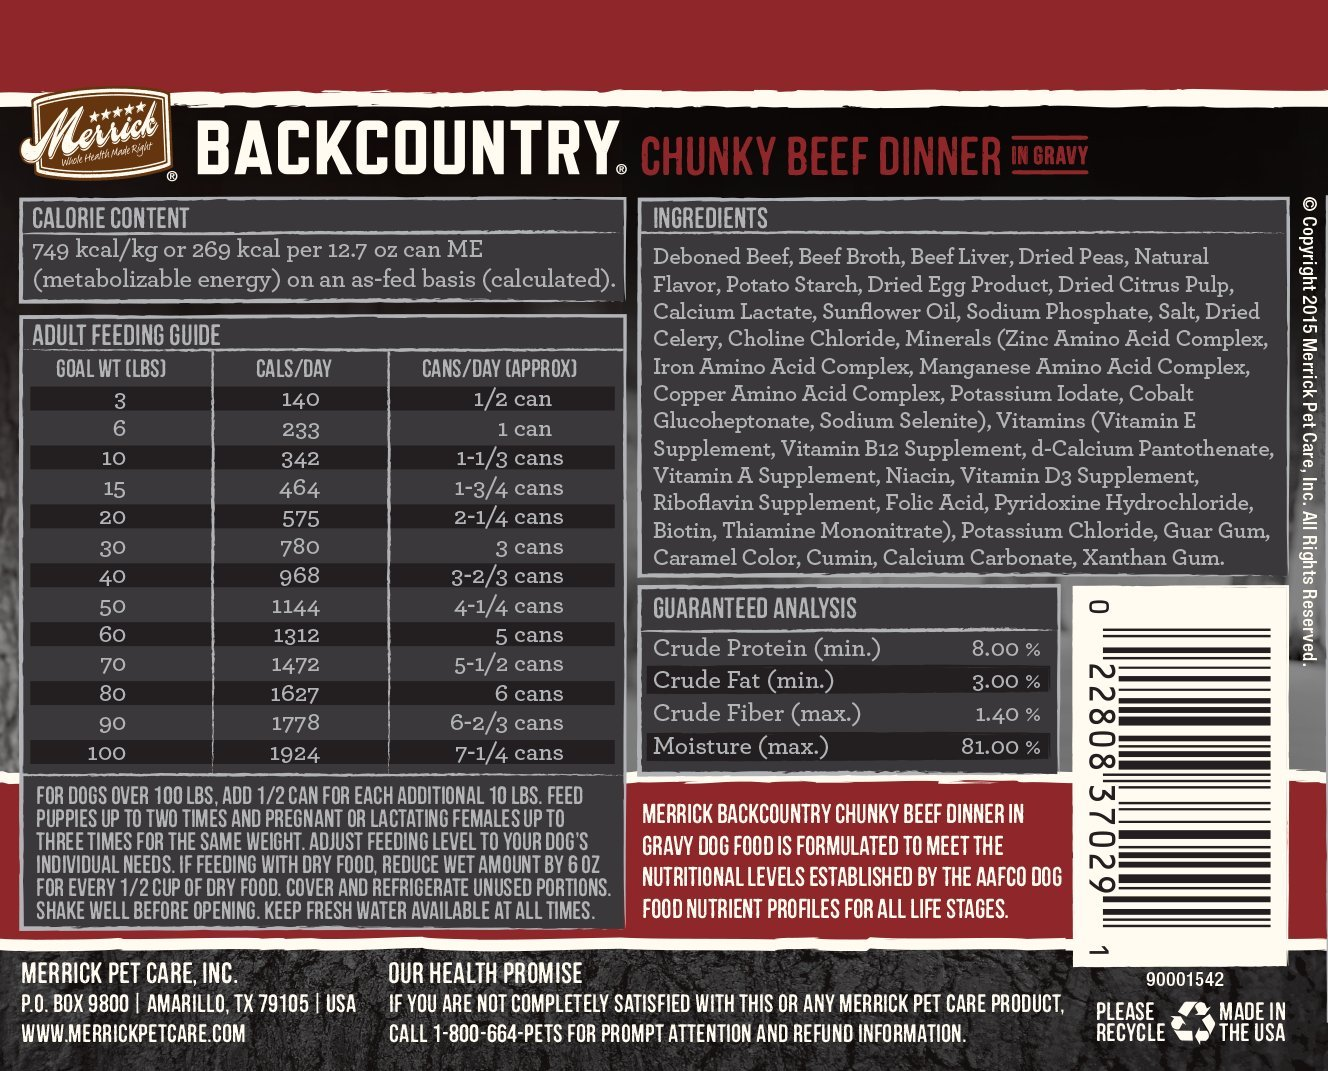 Merrick Backcountry Grain Free Wet Dog Food, 12.7 Oz, 12 Count Chunky Beef